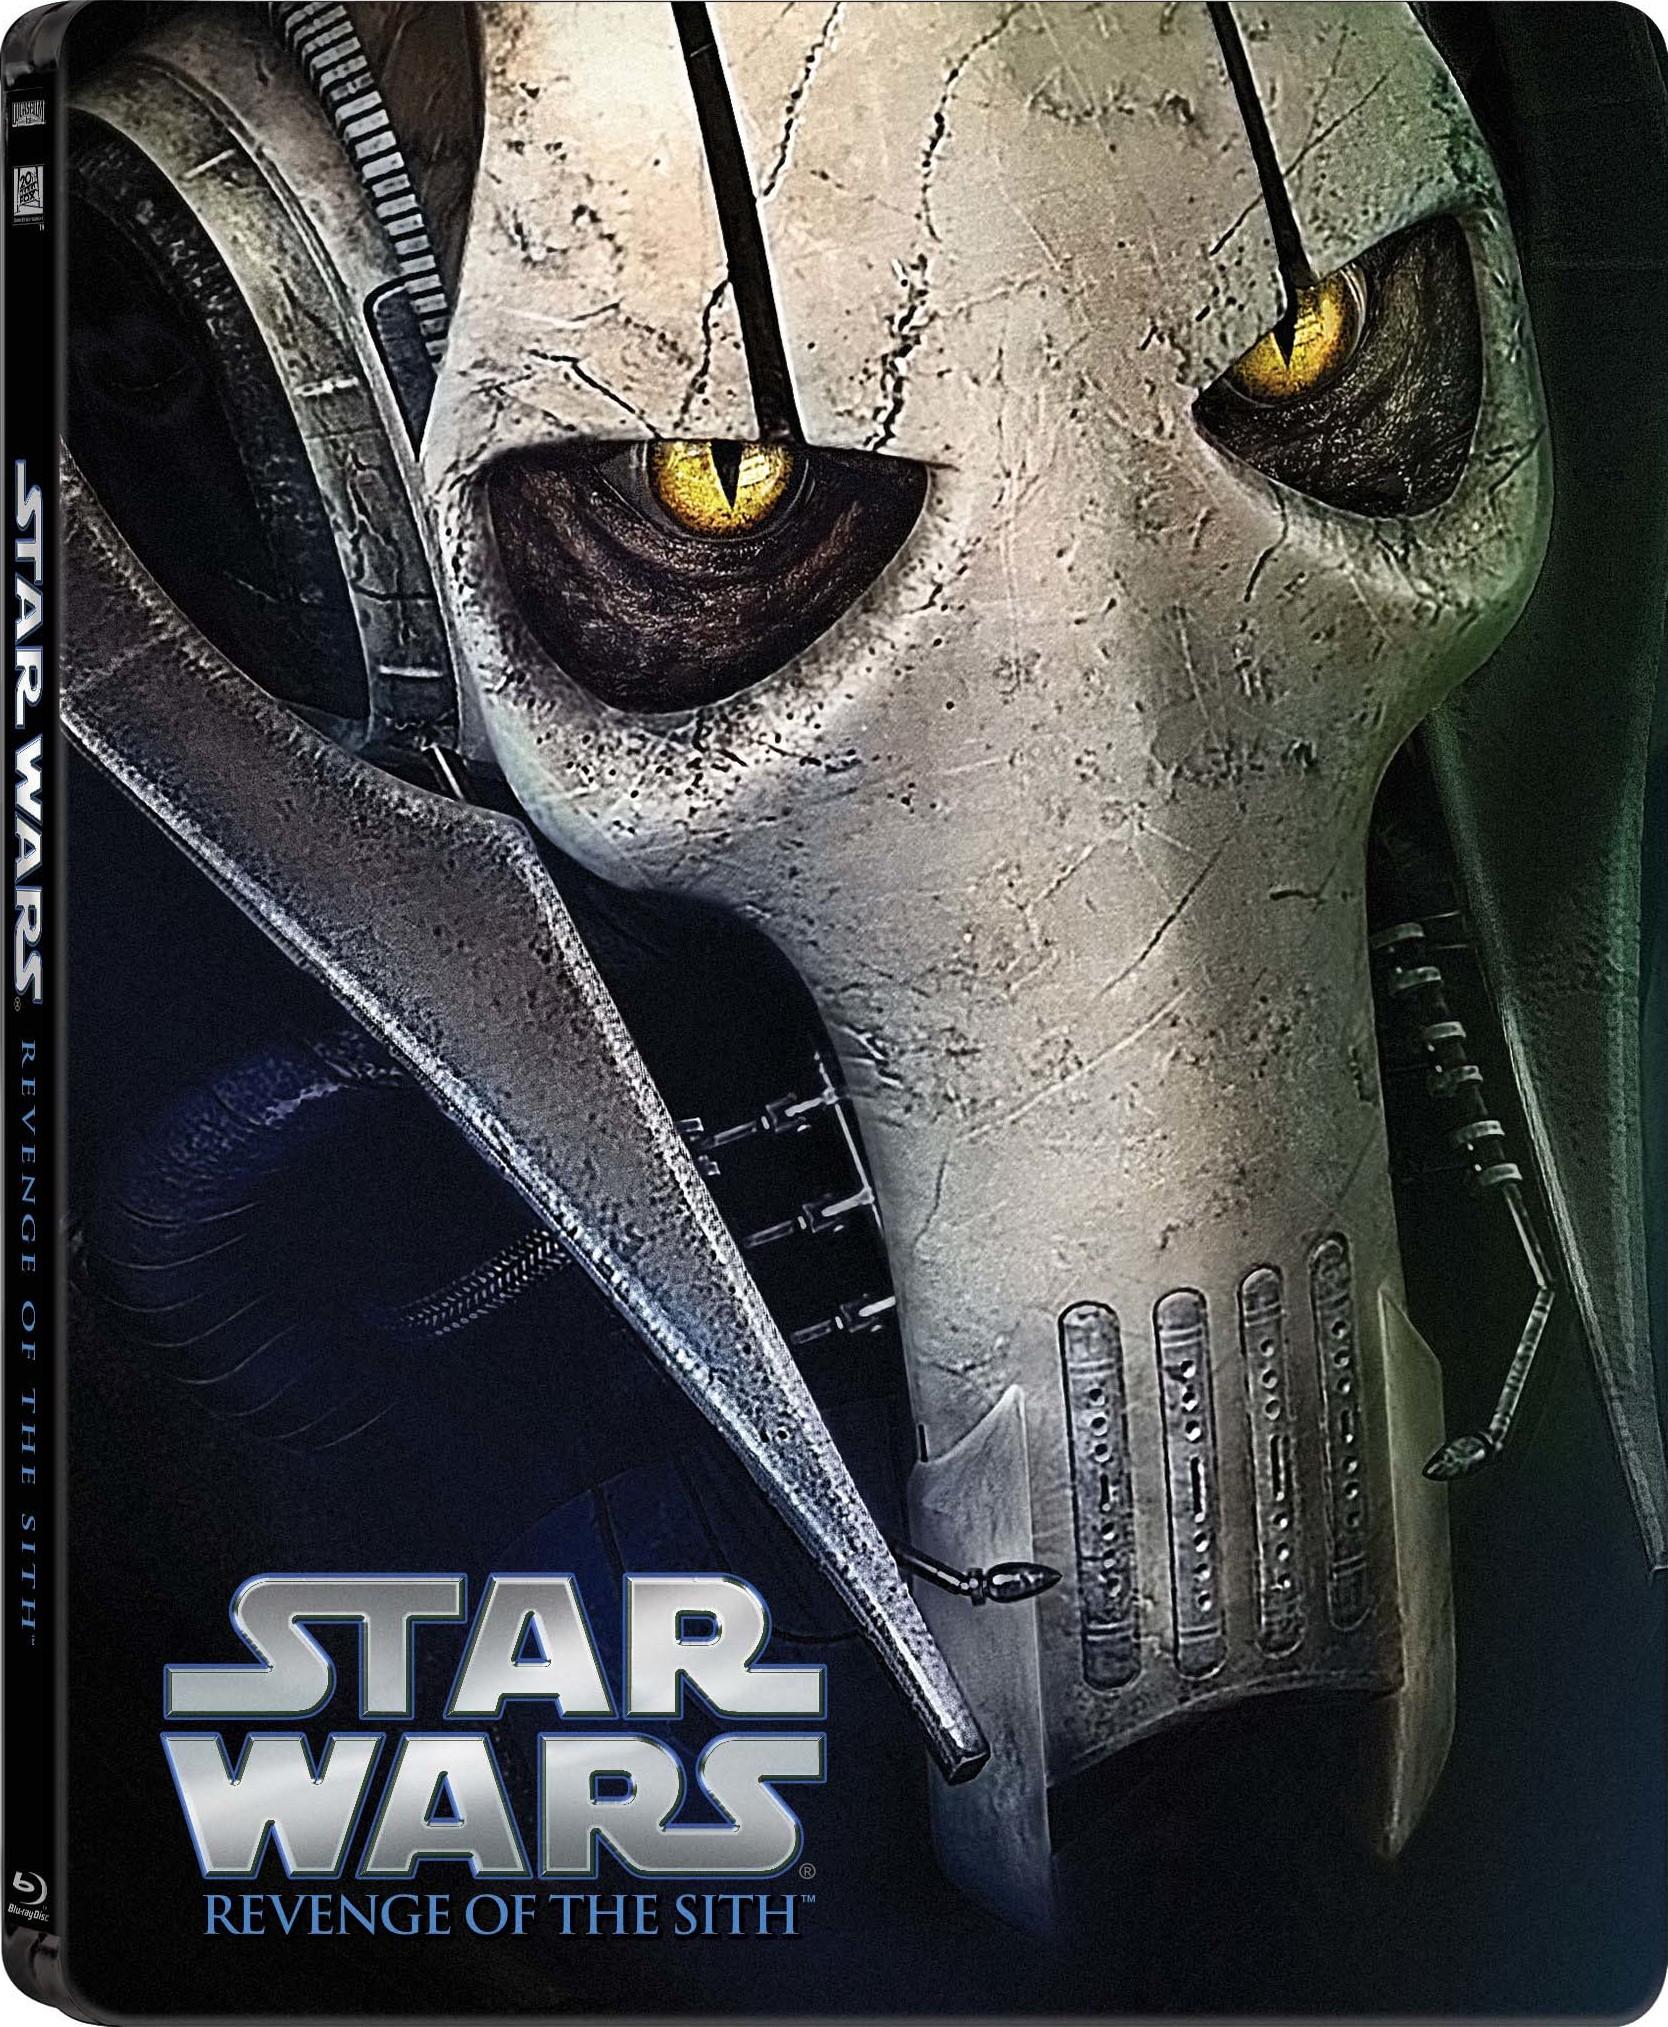 Star Wars Revenge of the Sith SteelBook